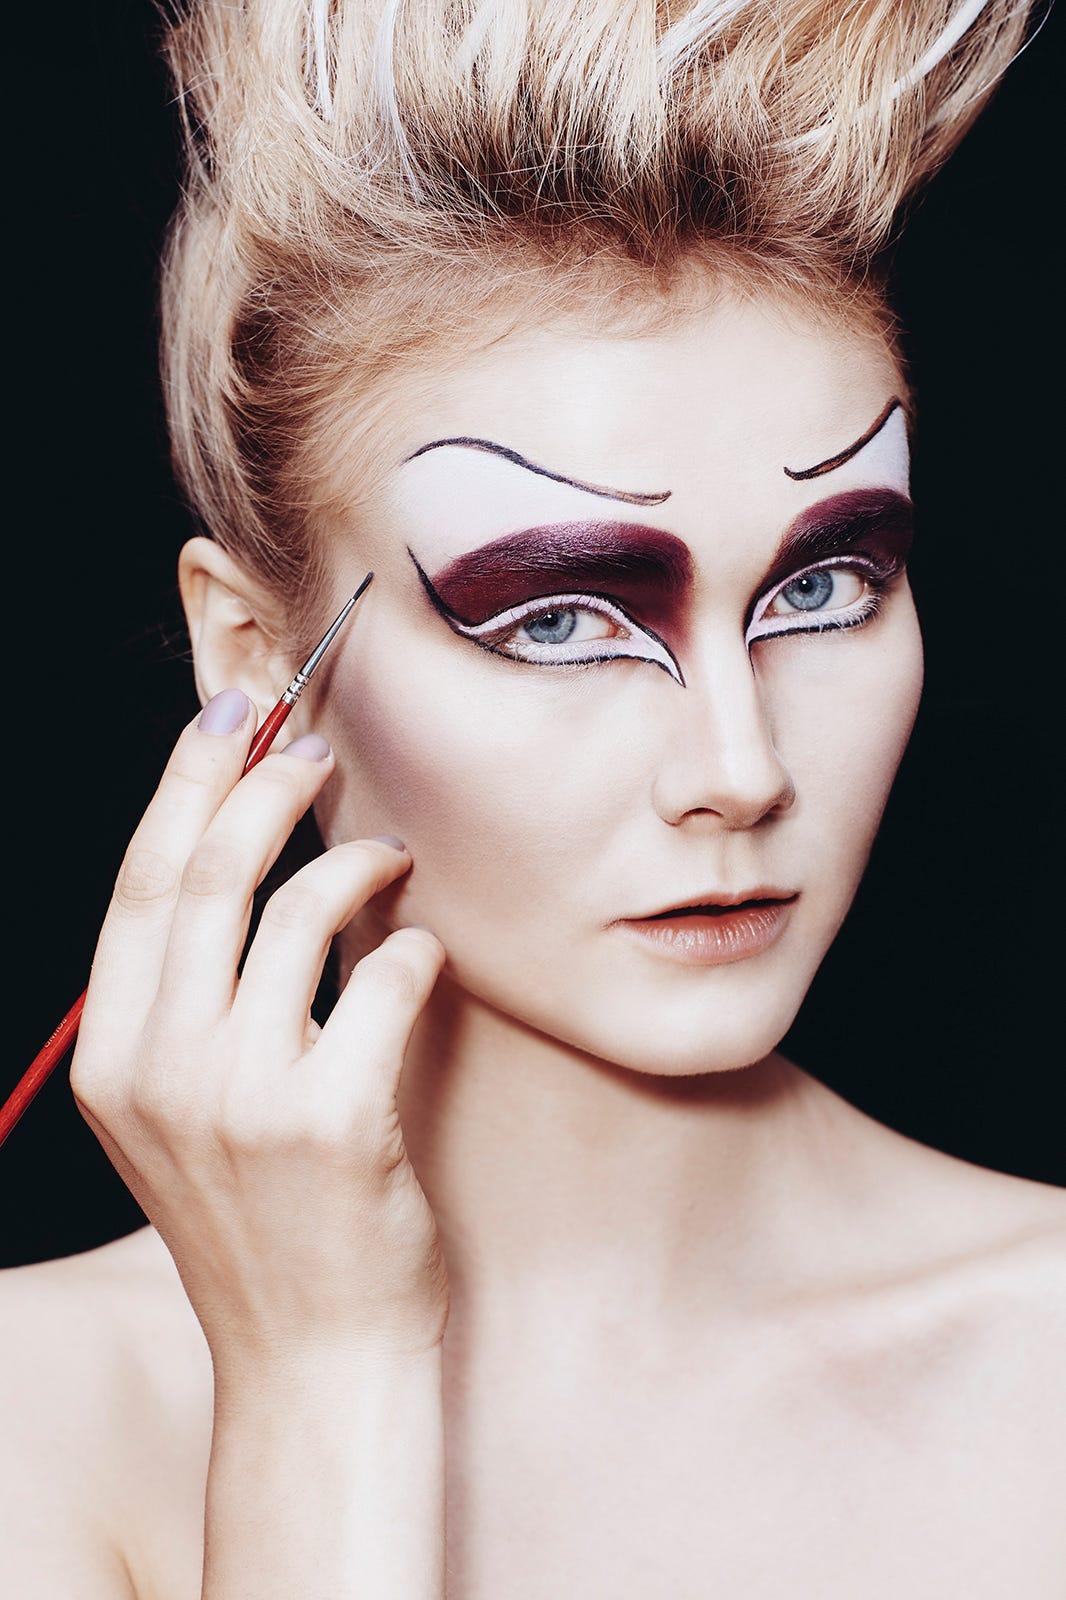 Cool Makeup Halloween Costume Ideas